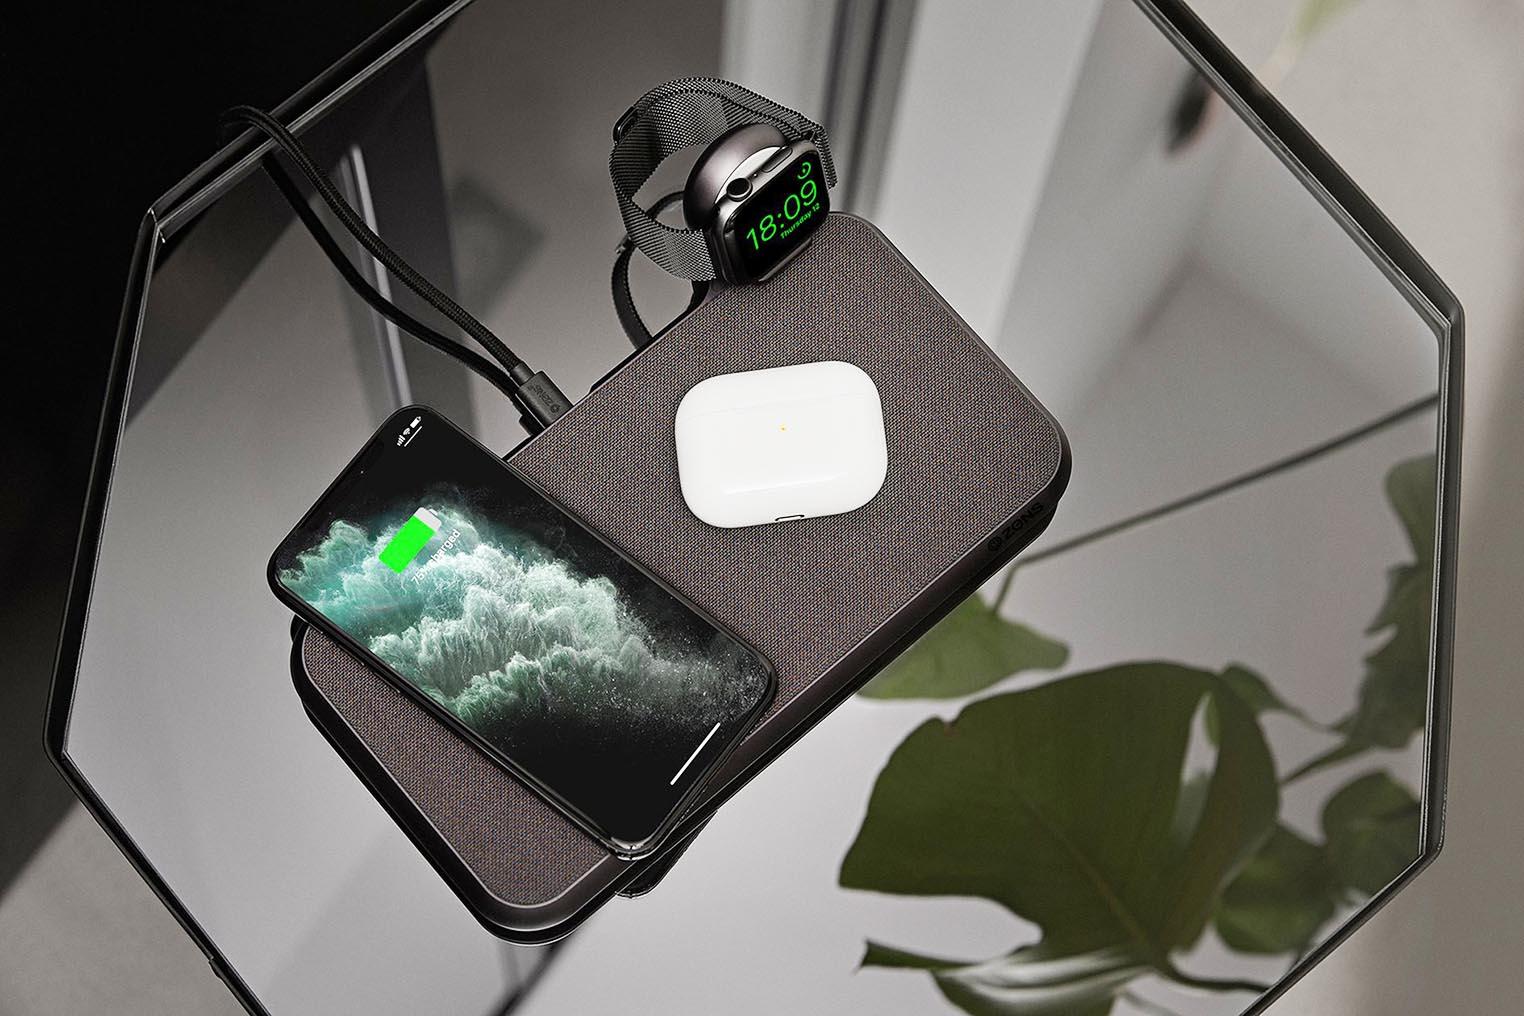 ZENS Liberty Wireless Charger